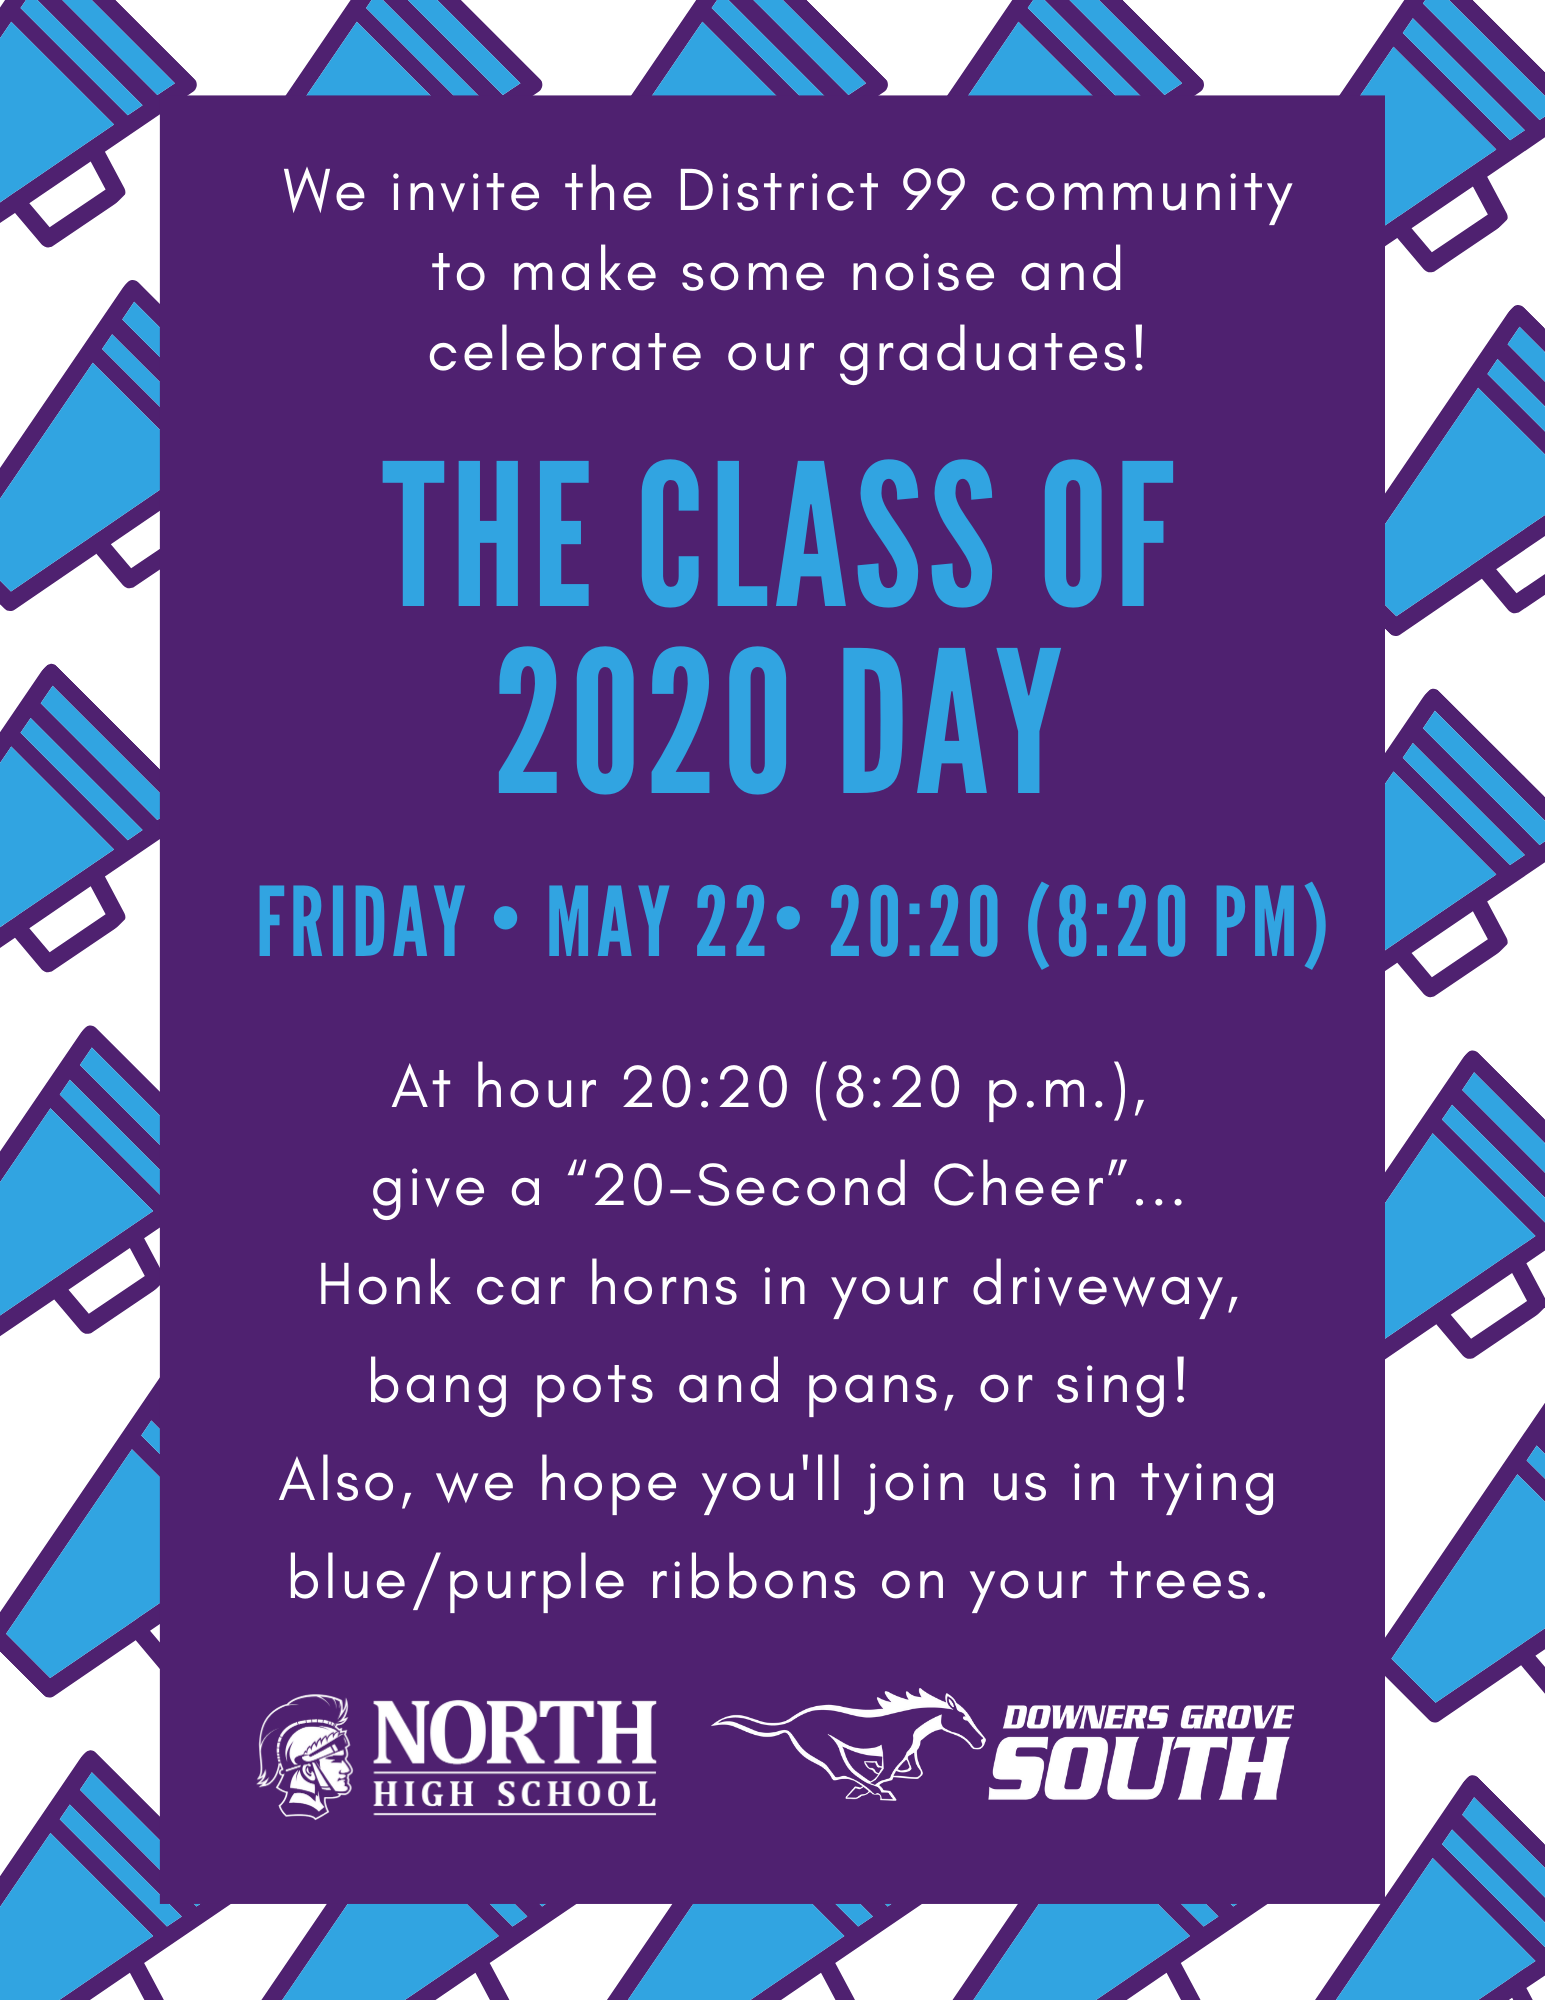 051320-Class of 2020 Day FINAL (1)